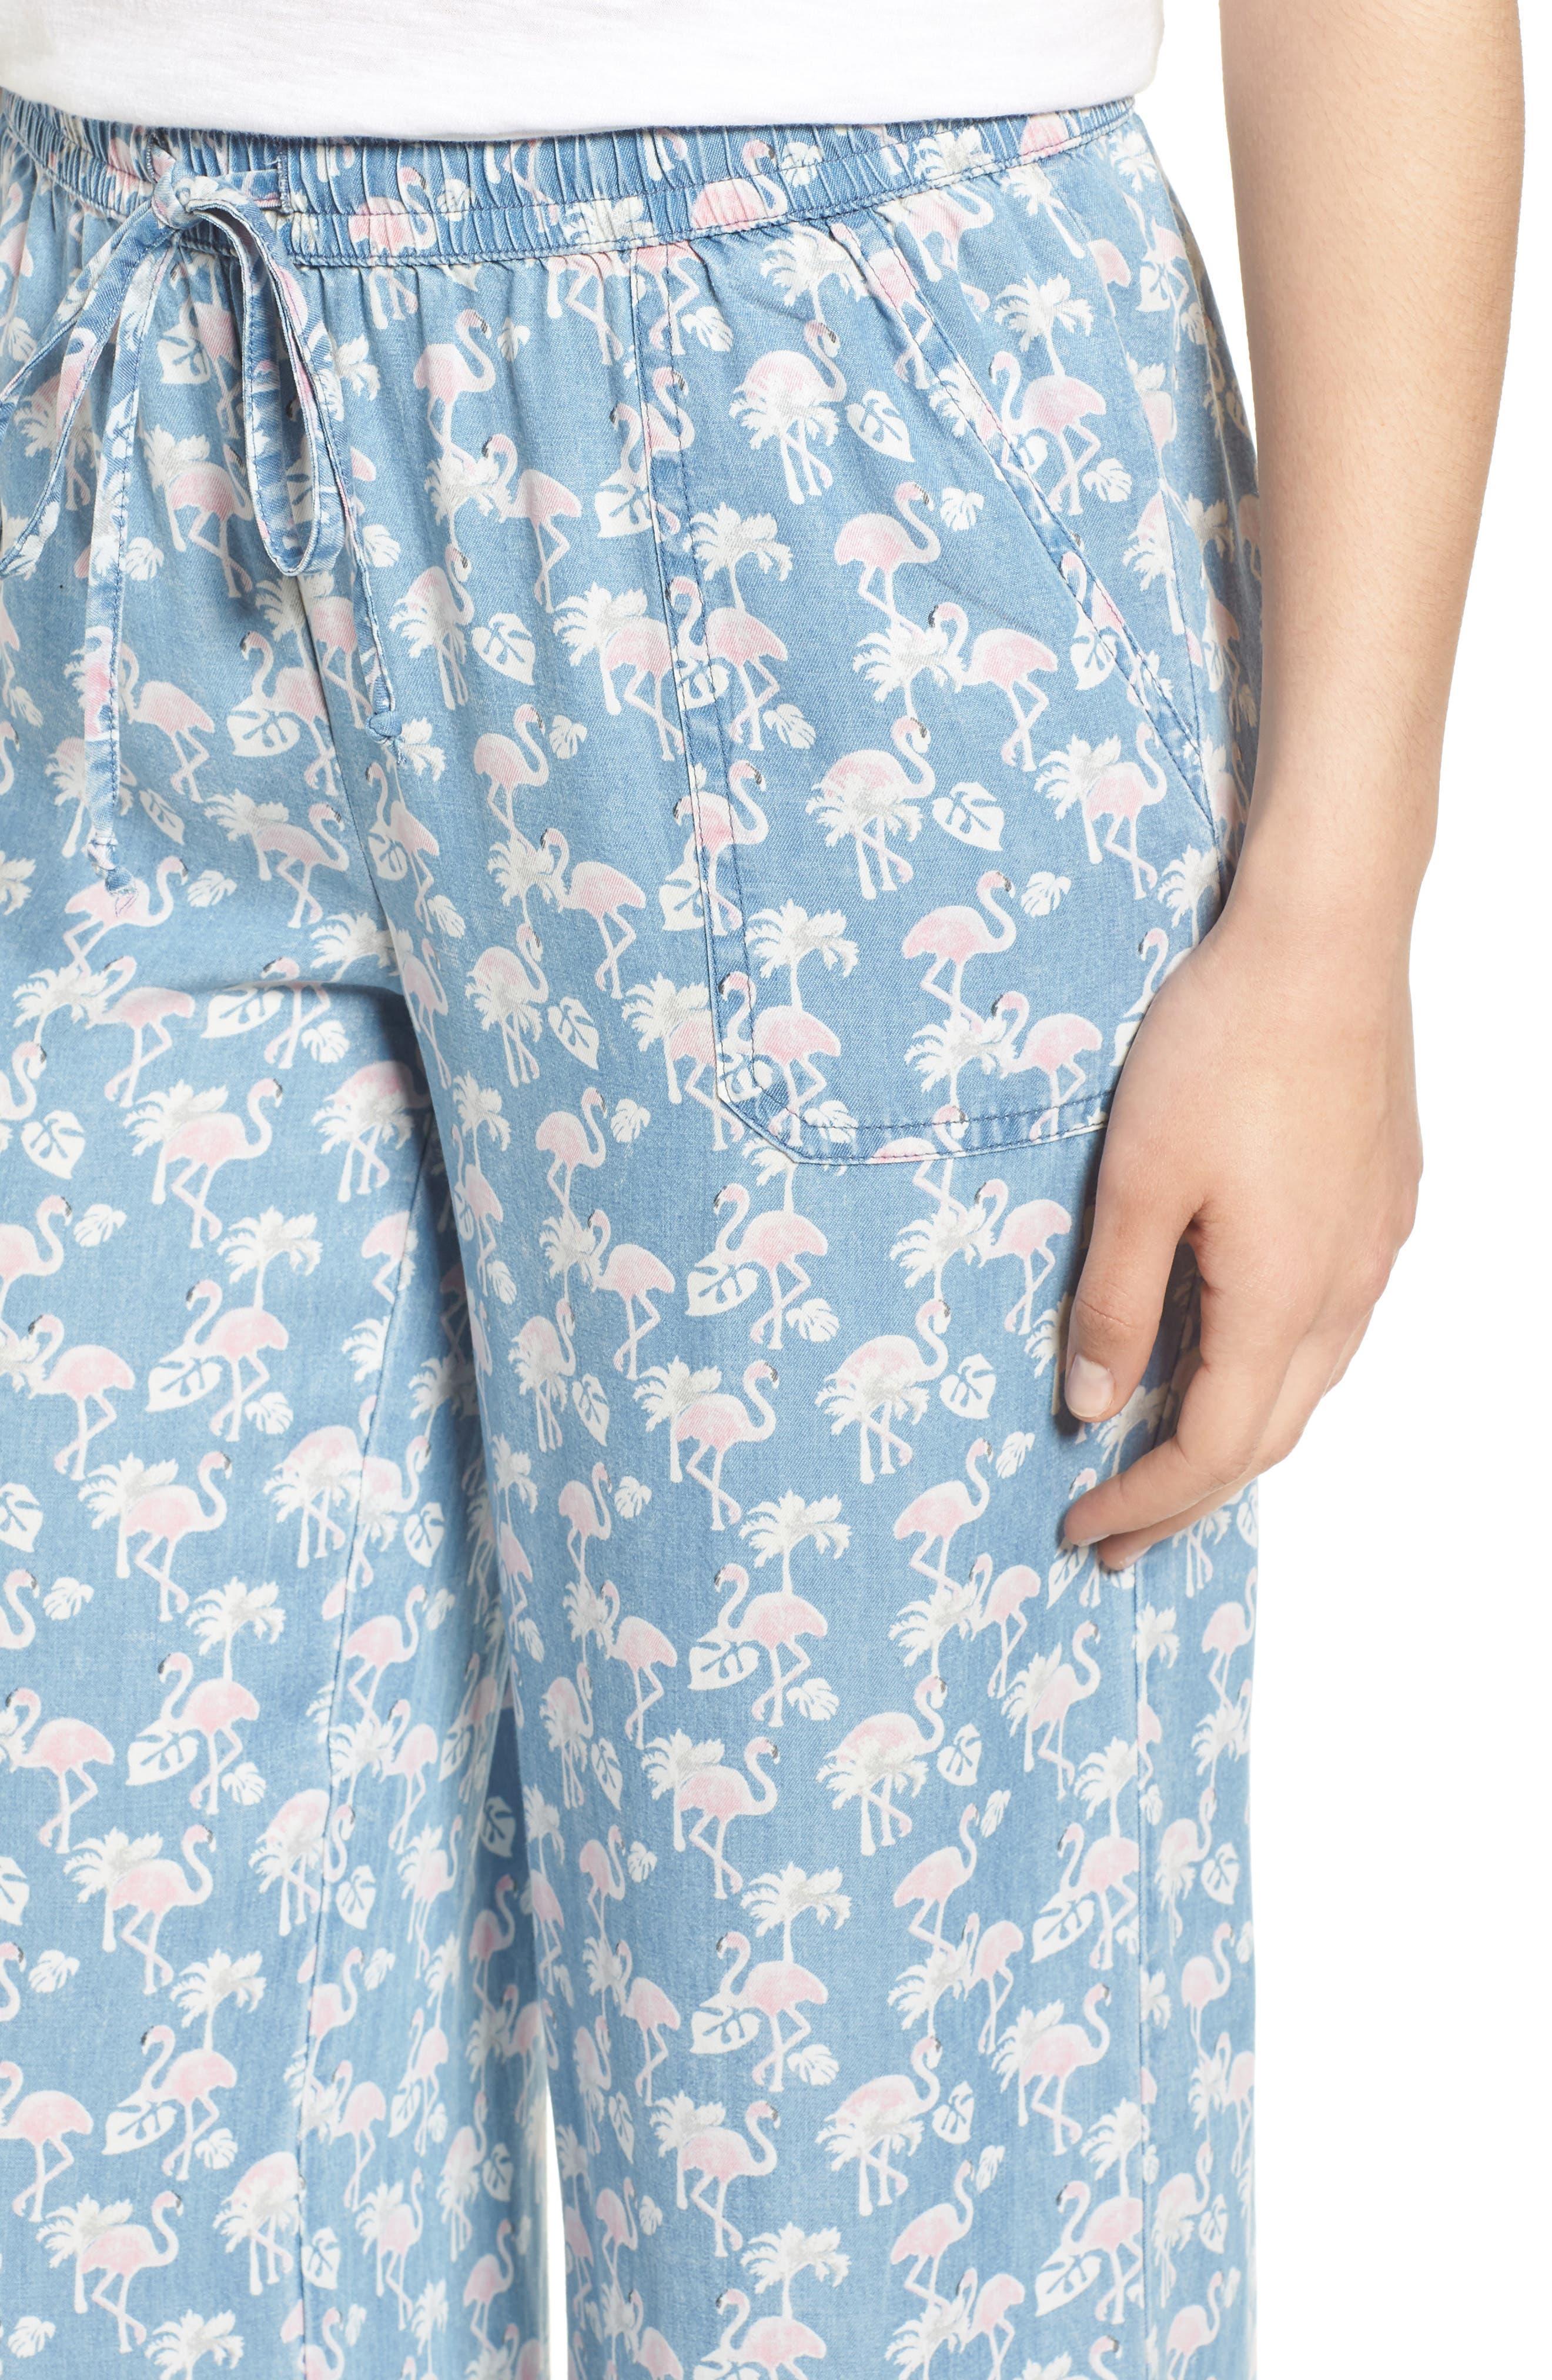 Pink Flamingo Drawstring Pants,                             Alternate thumbnail 4, color,                             BLUE FLAMINGO